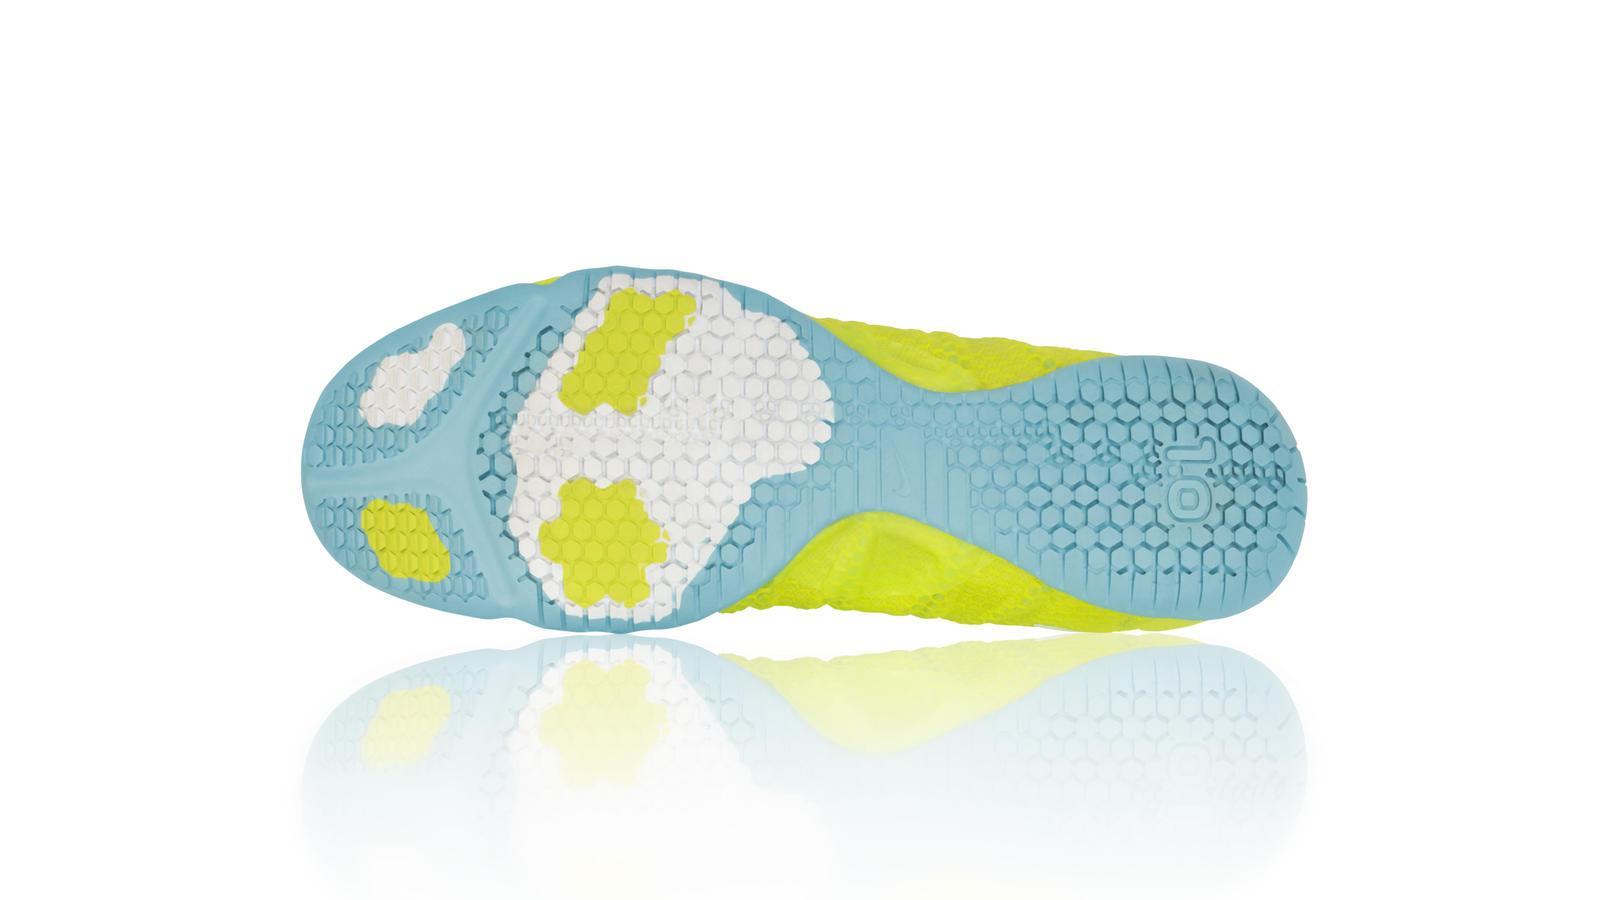 Nike Free 1.0 Cross Bionic outsole